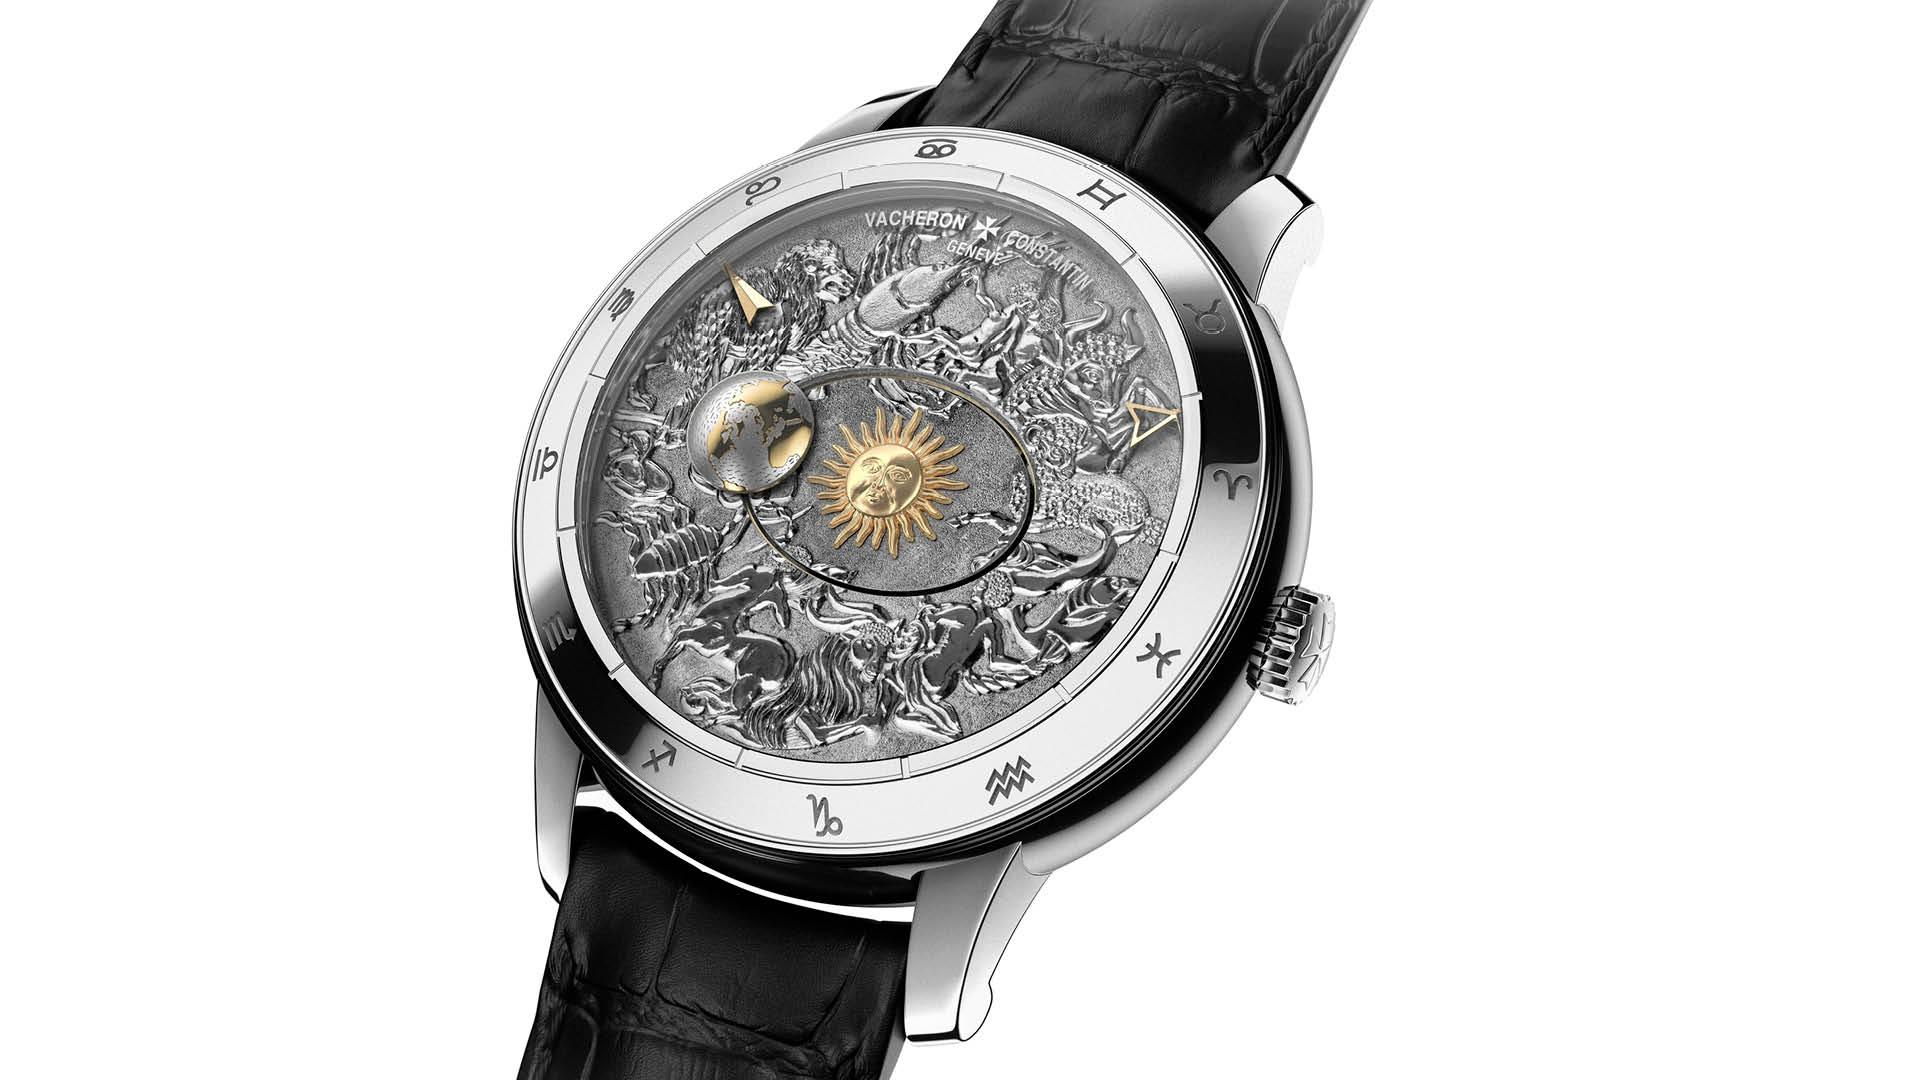 Vacheron Constantin's Art of Engraving Copernicus Timepiece